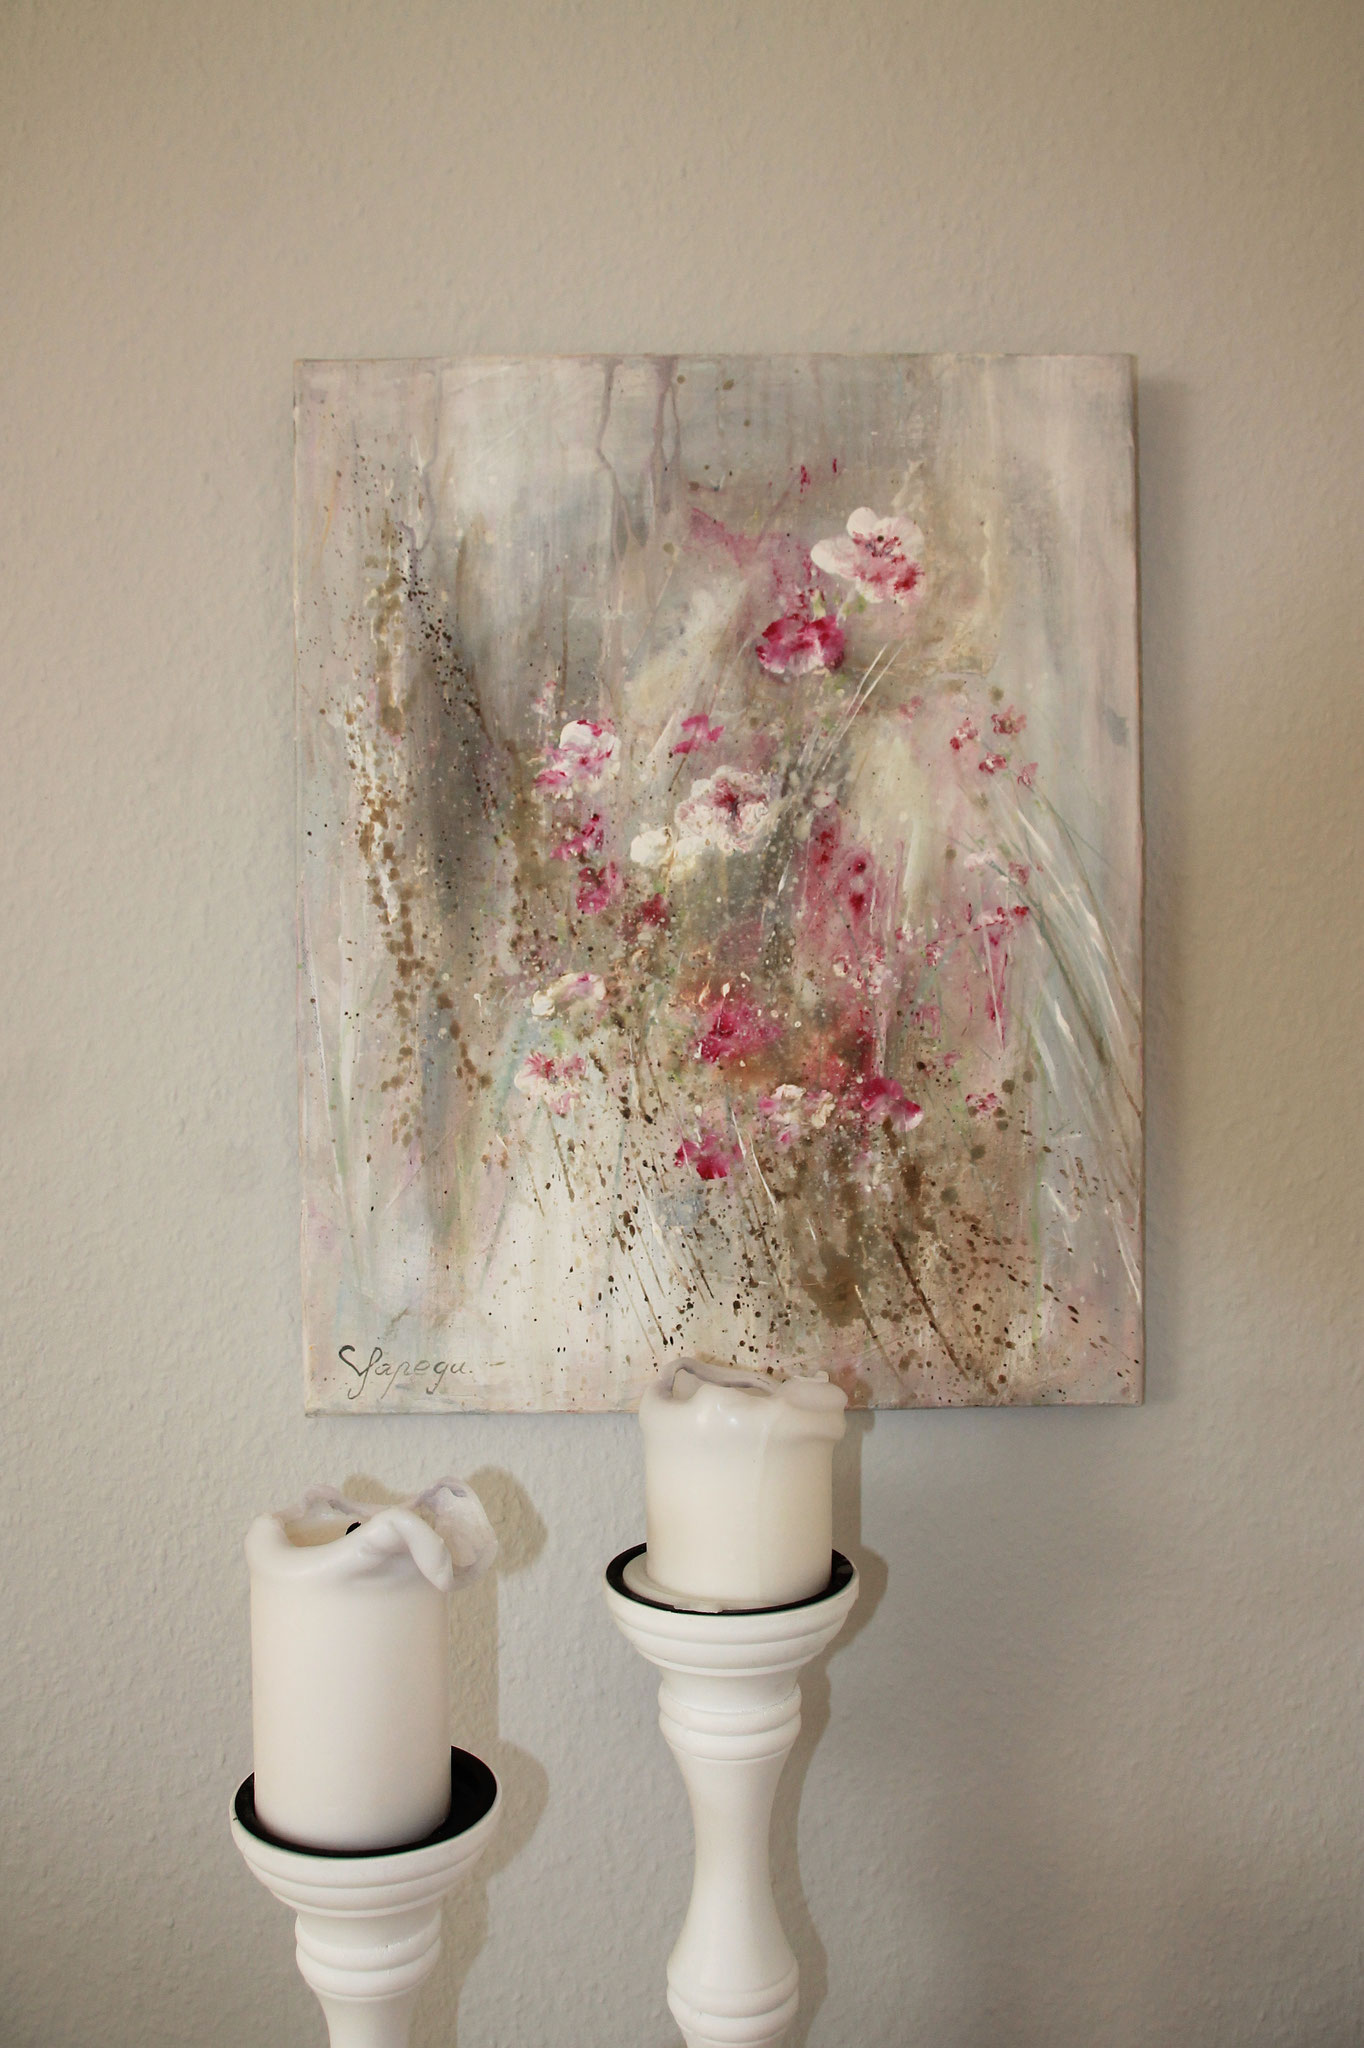 40  x 50 cm Acryl auf Leinwand